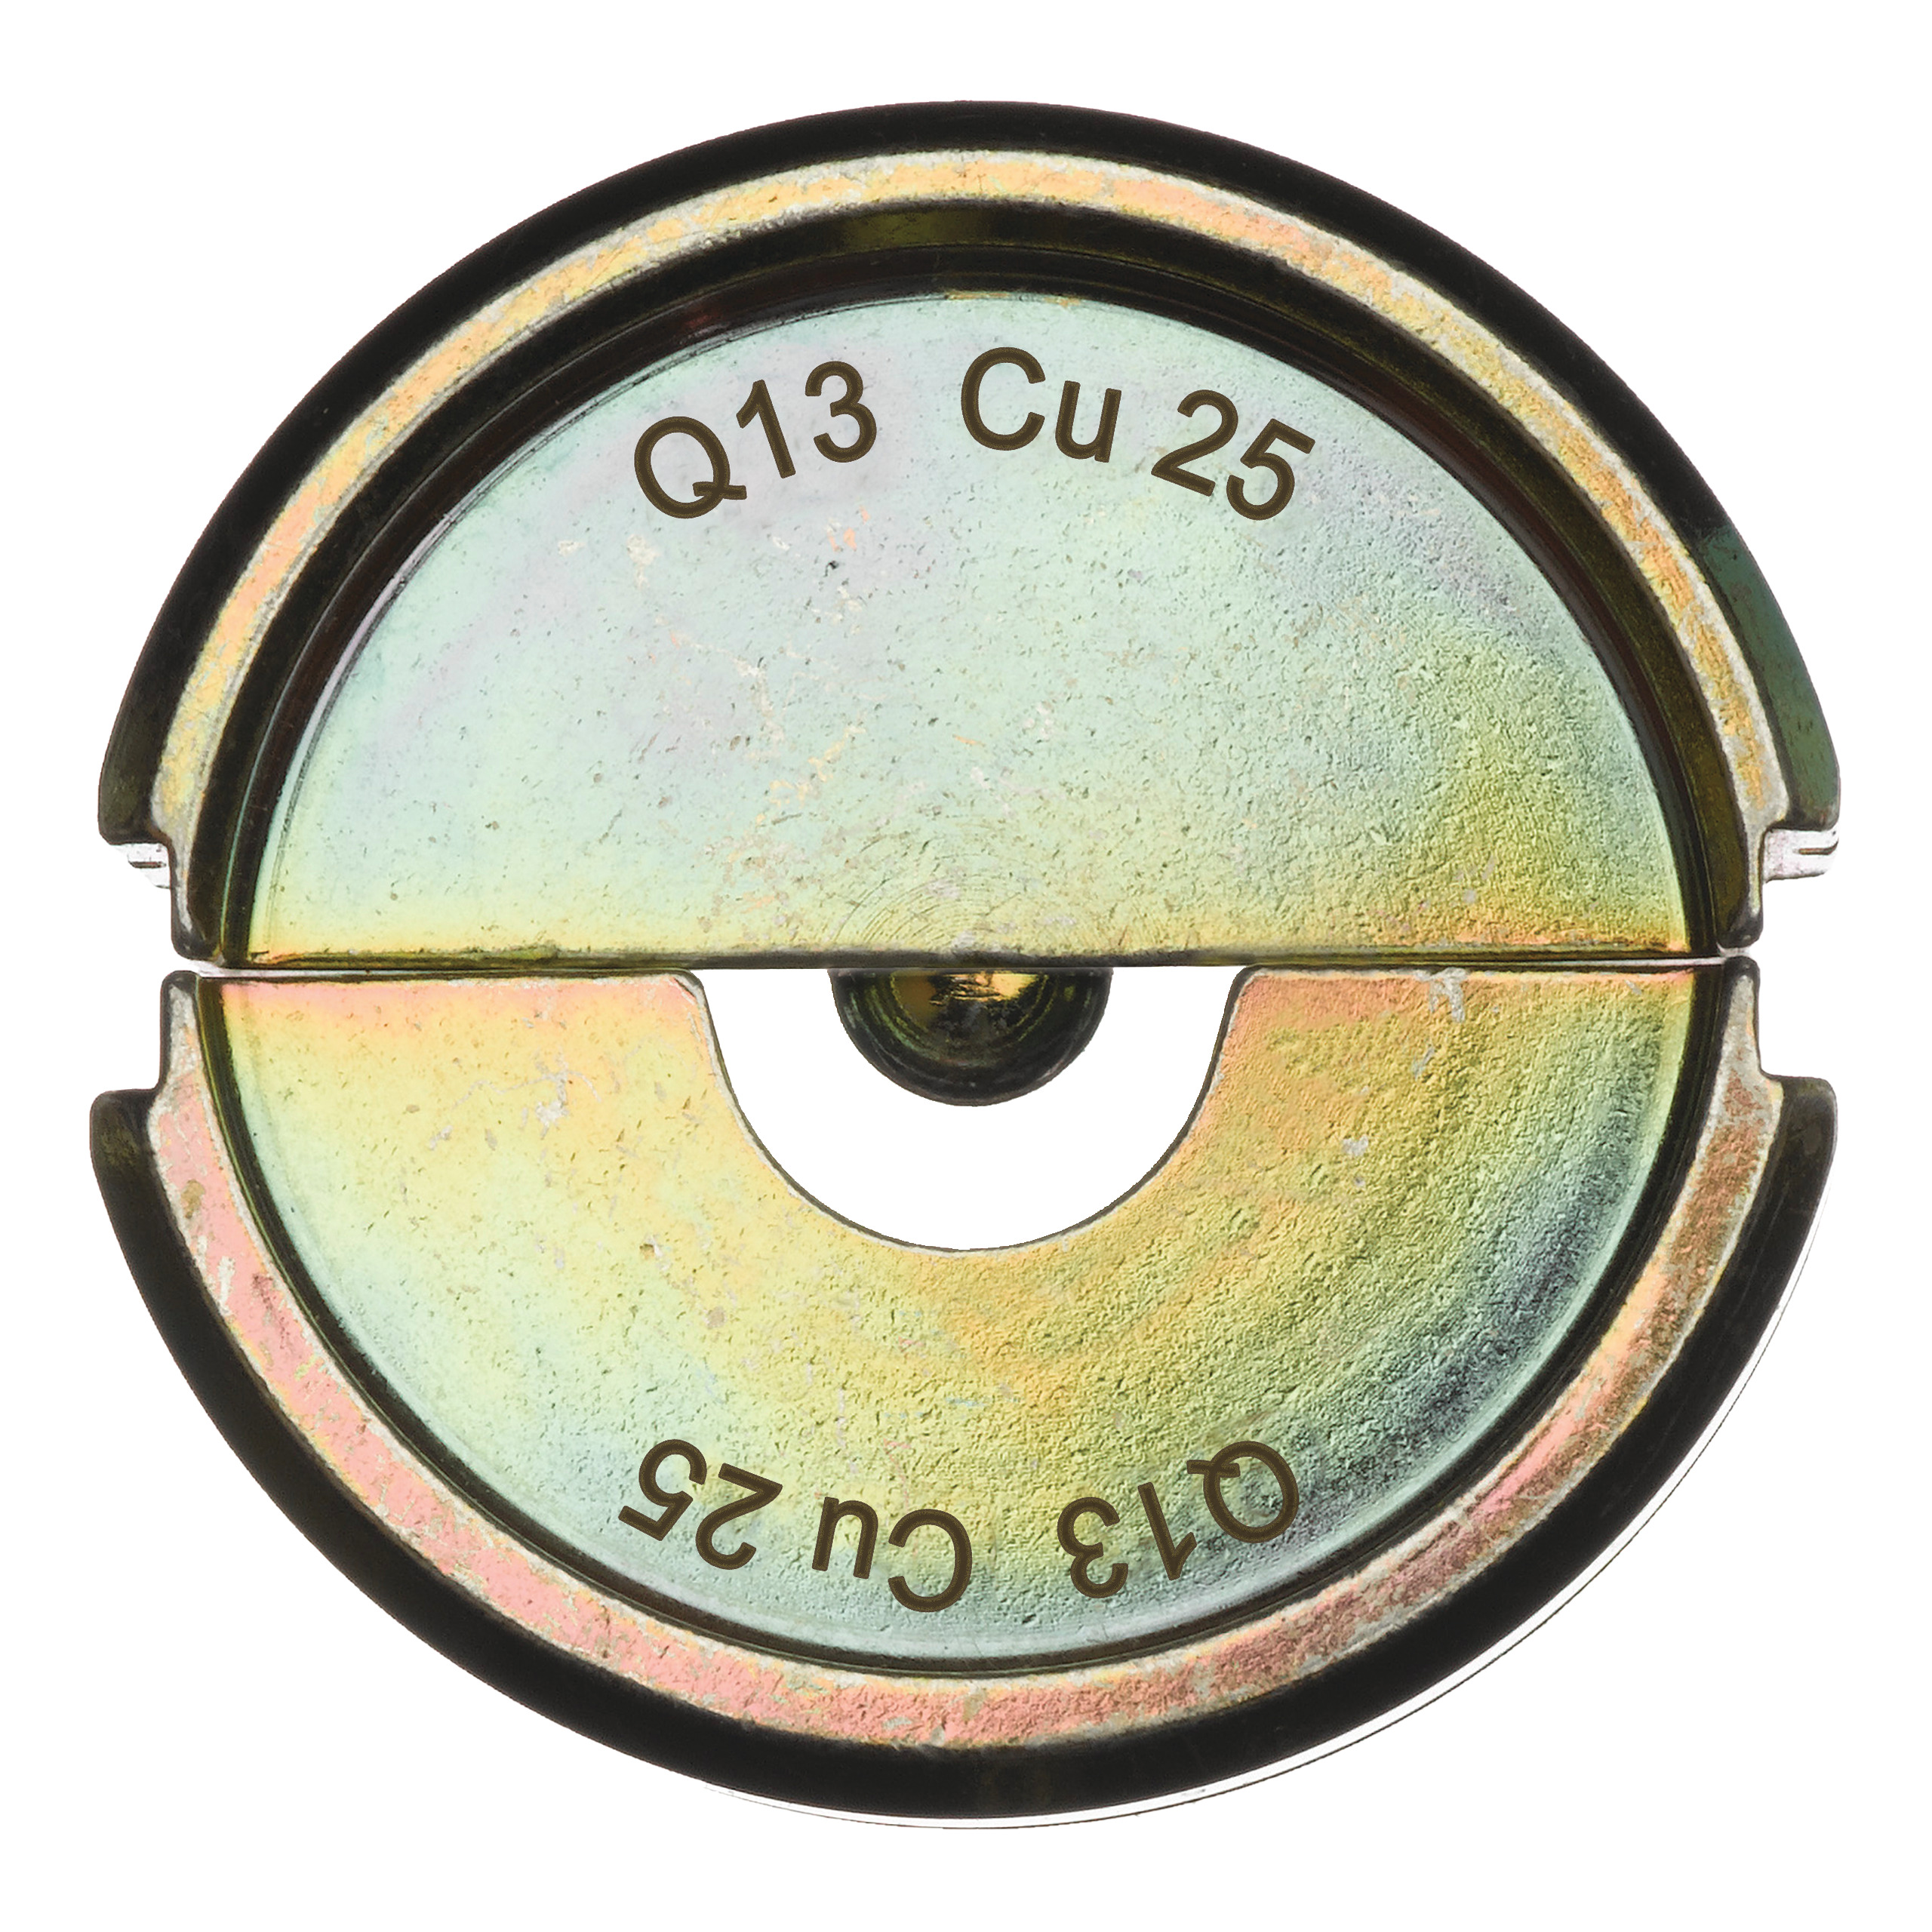 Q13 CU 25-1PC Pojistný kroužek